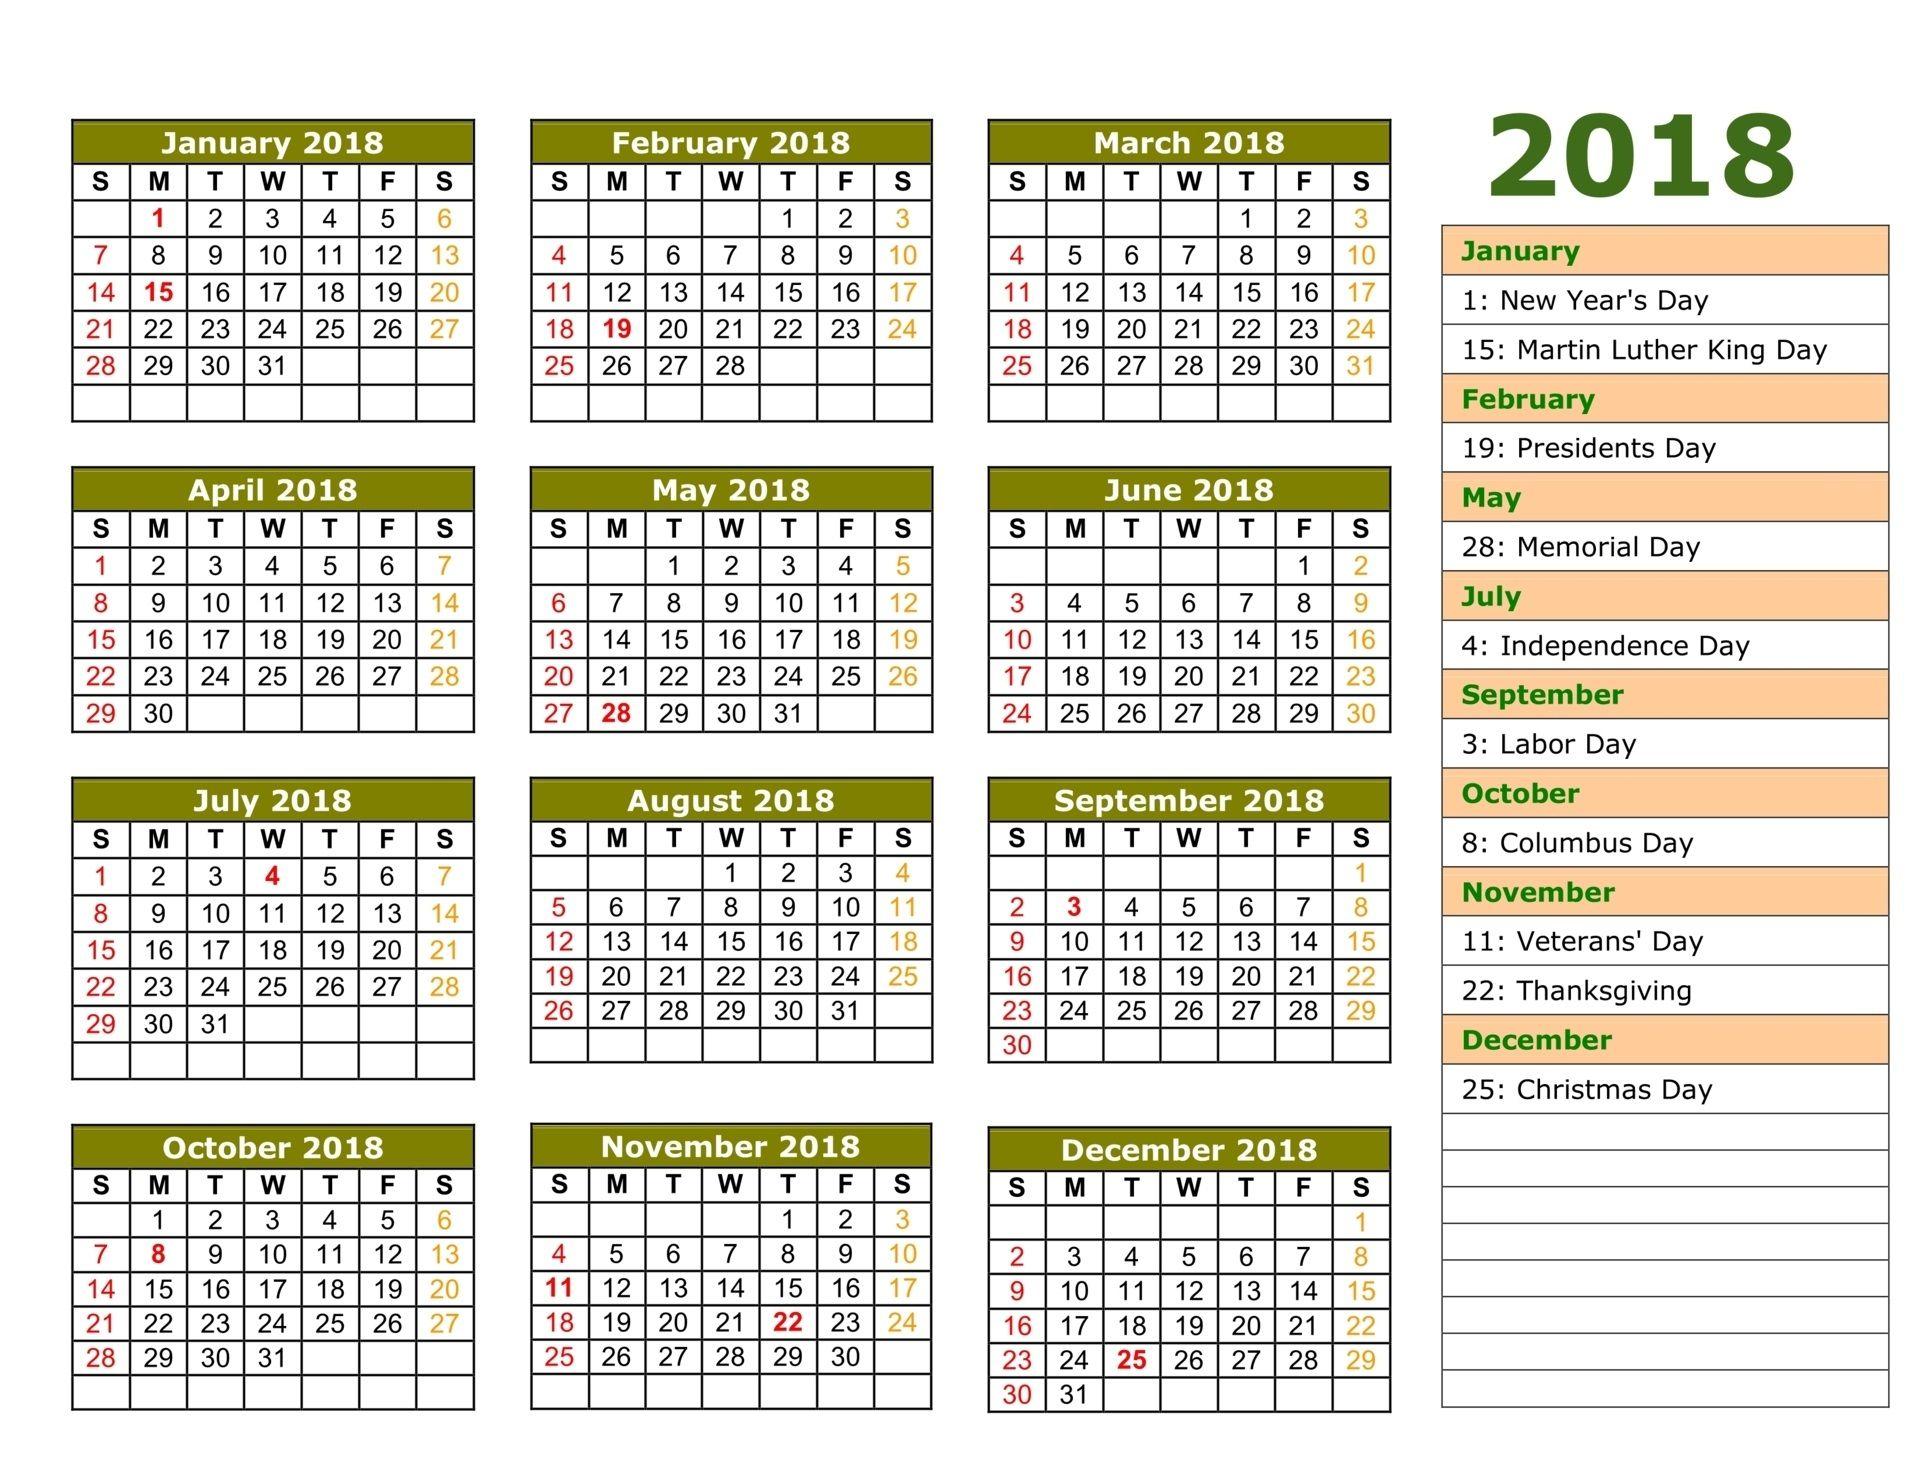 Islamic Calendar 2018, Hijri Calendar 2018